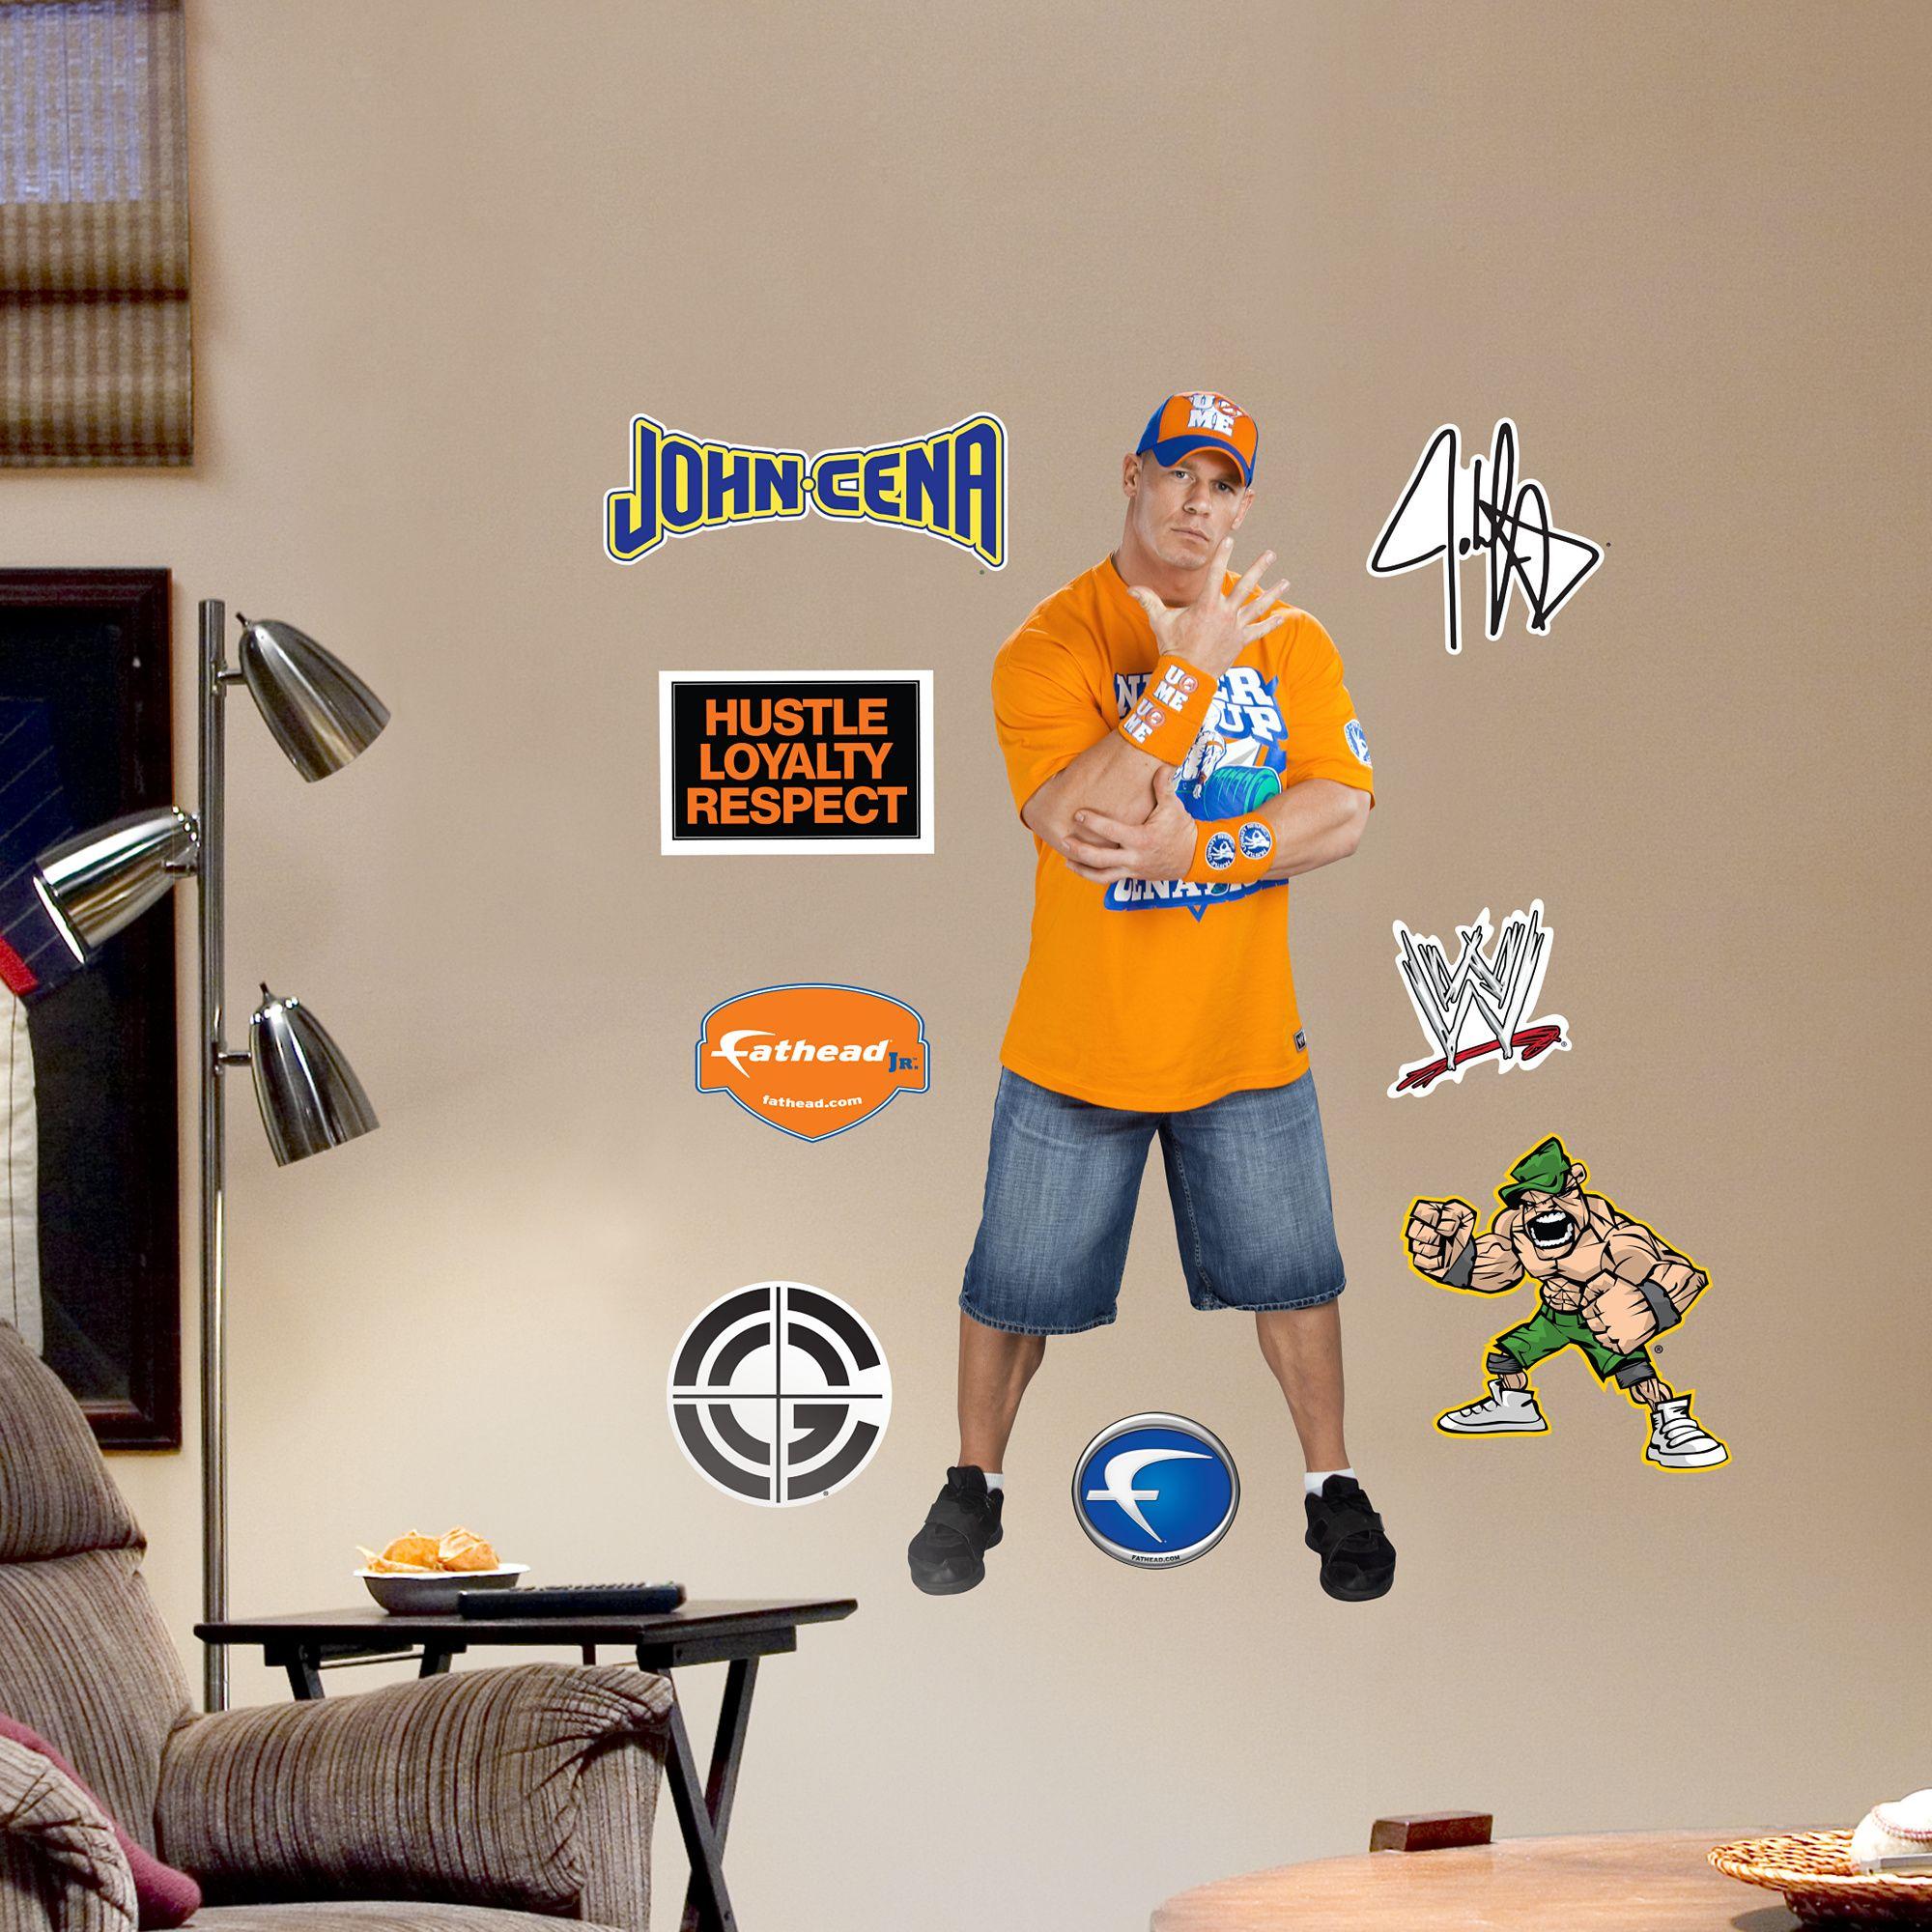 John Cena Fathead Jr John Cena Fathead Kids House